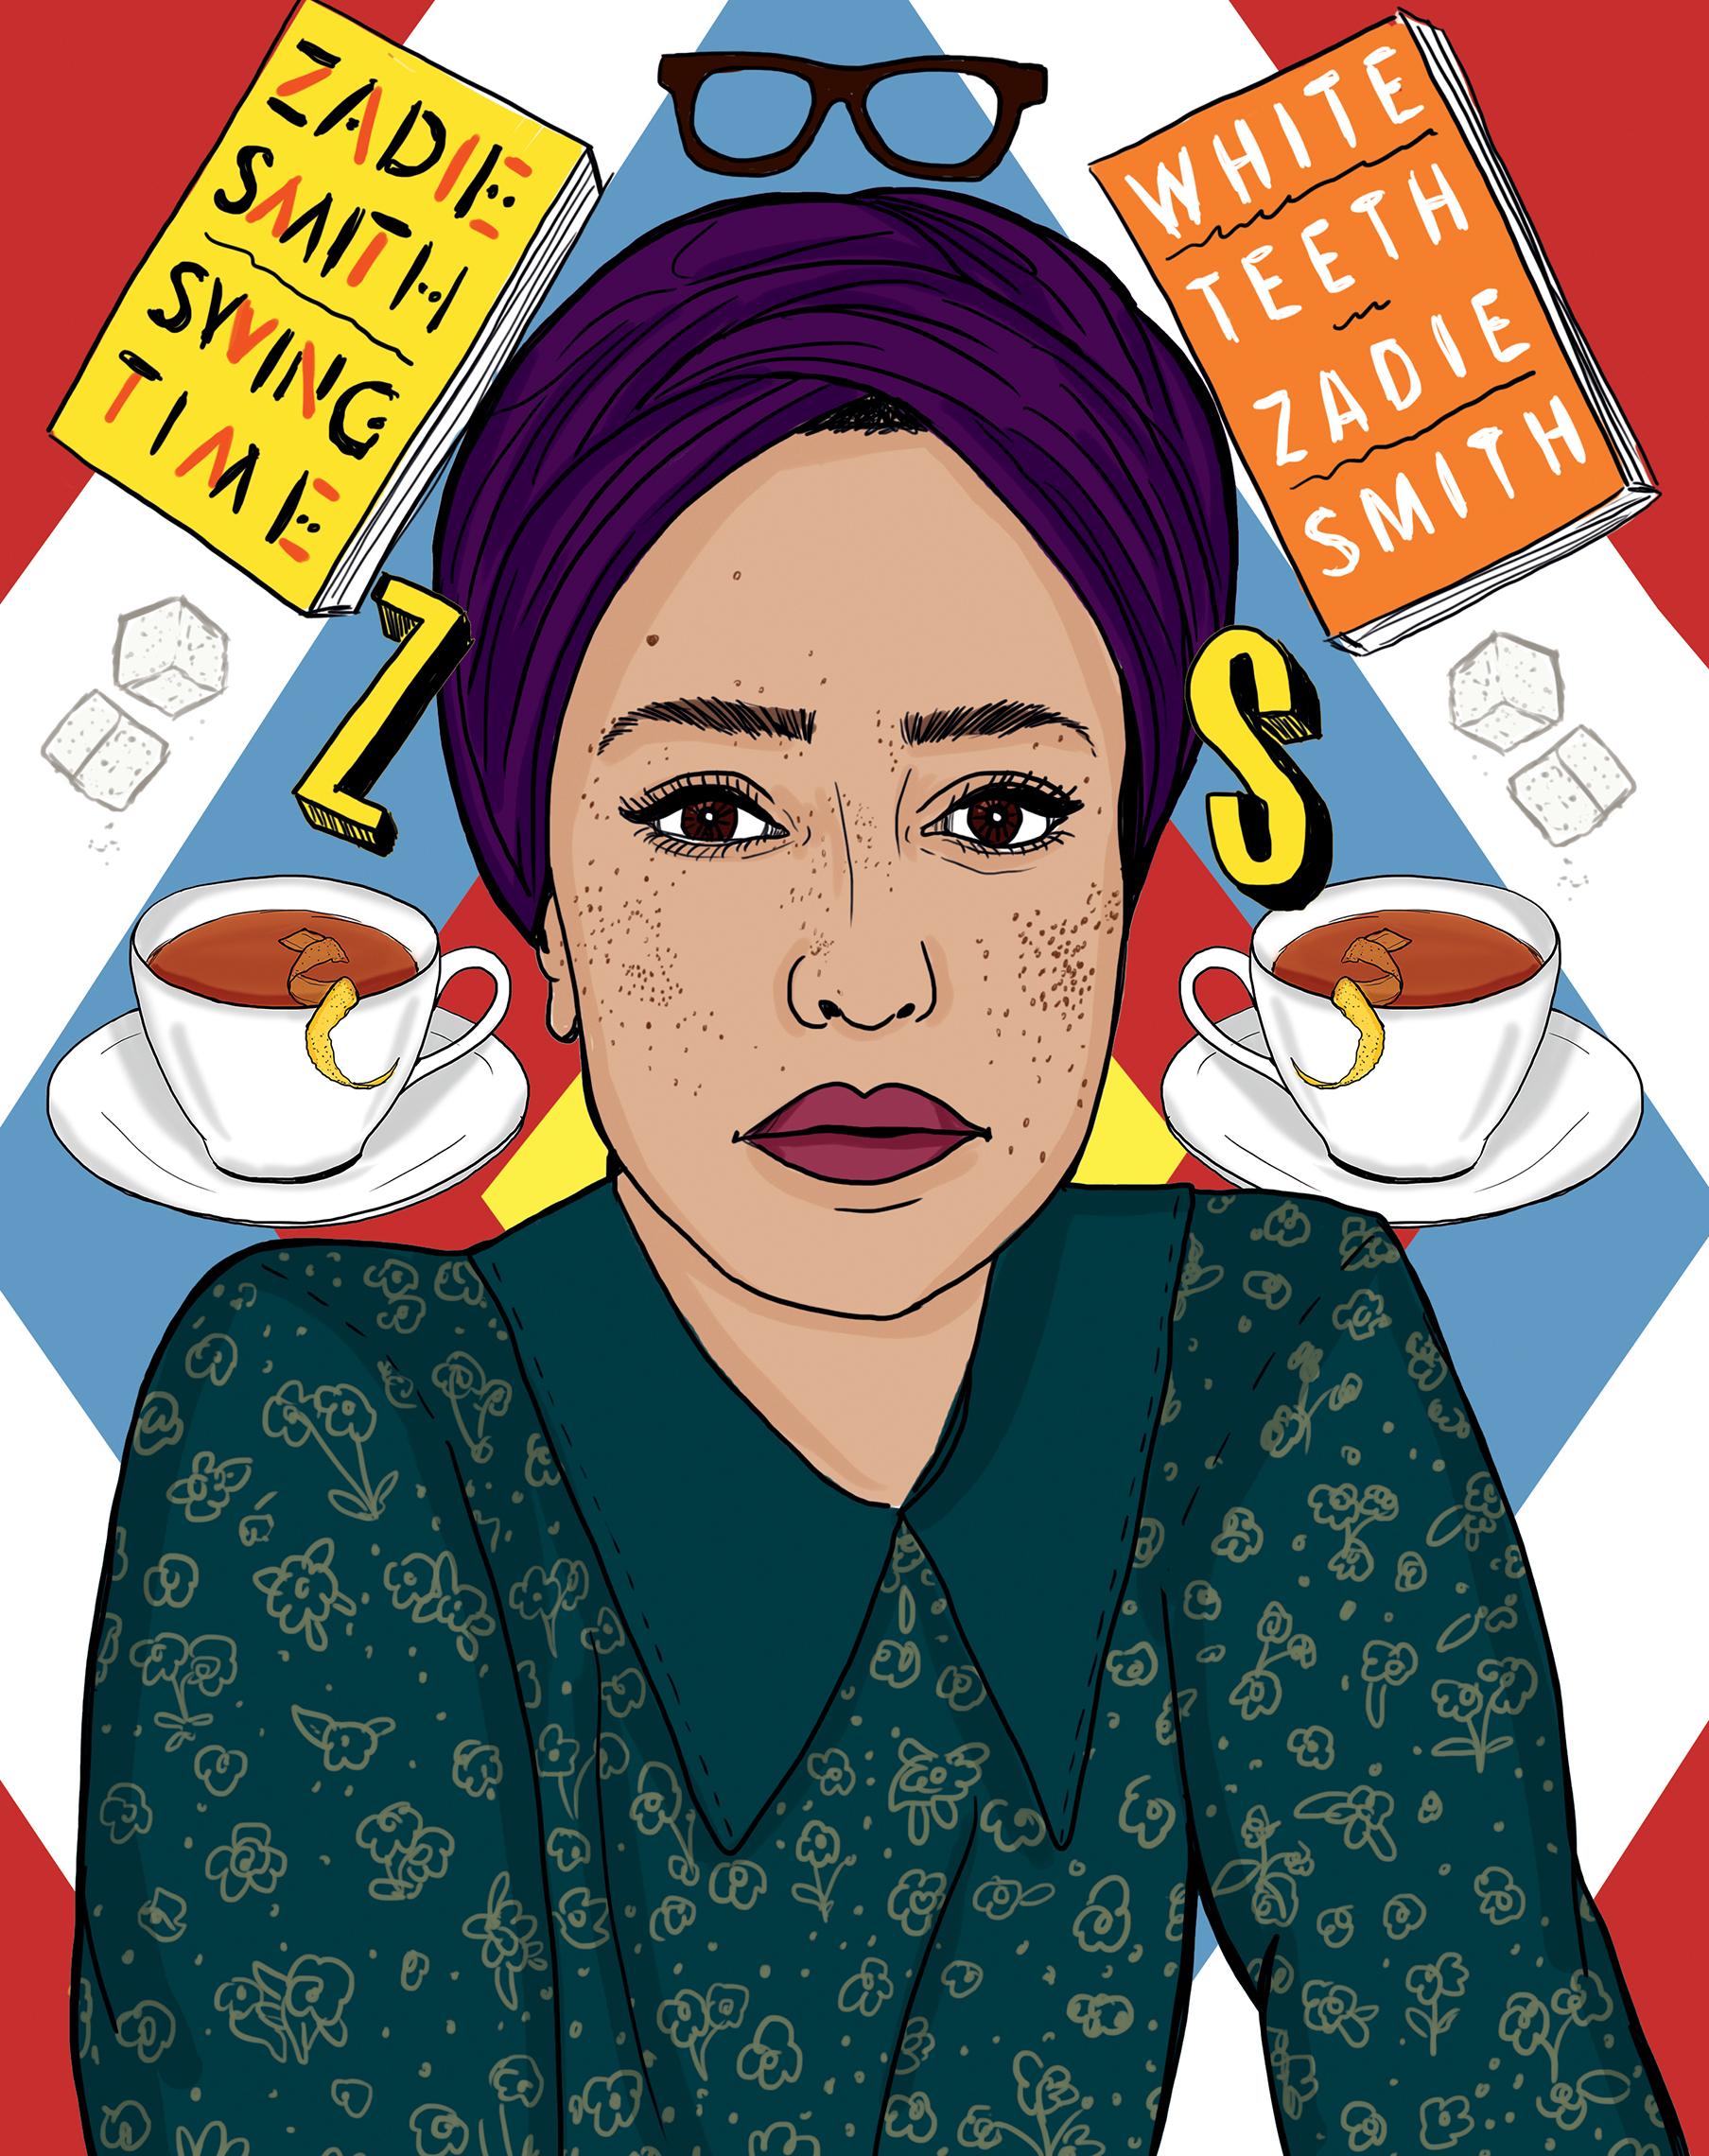 Illustrations by Kelly Shami